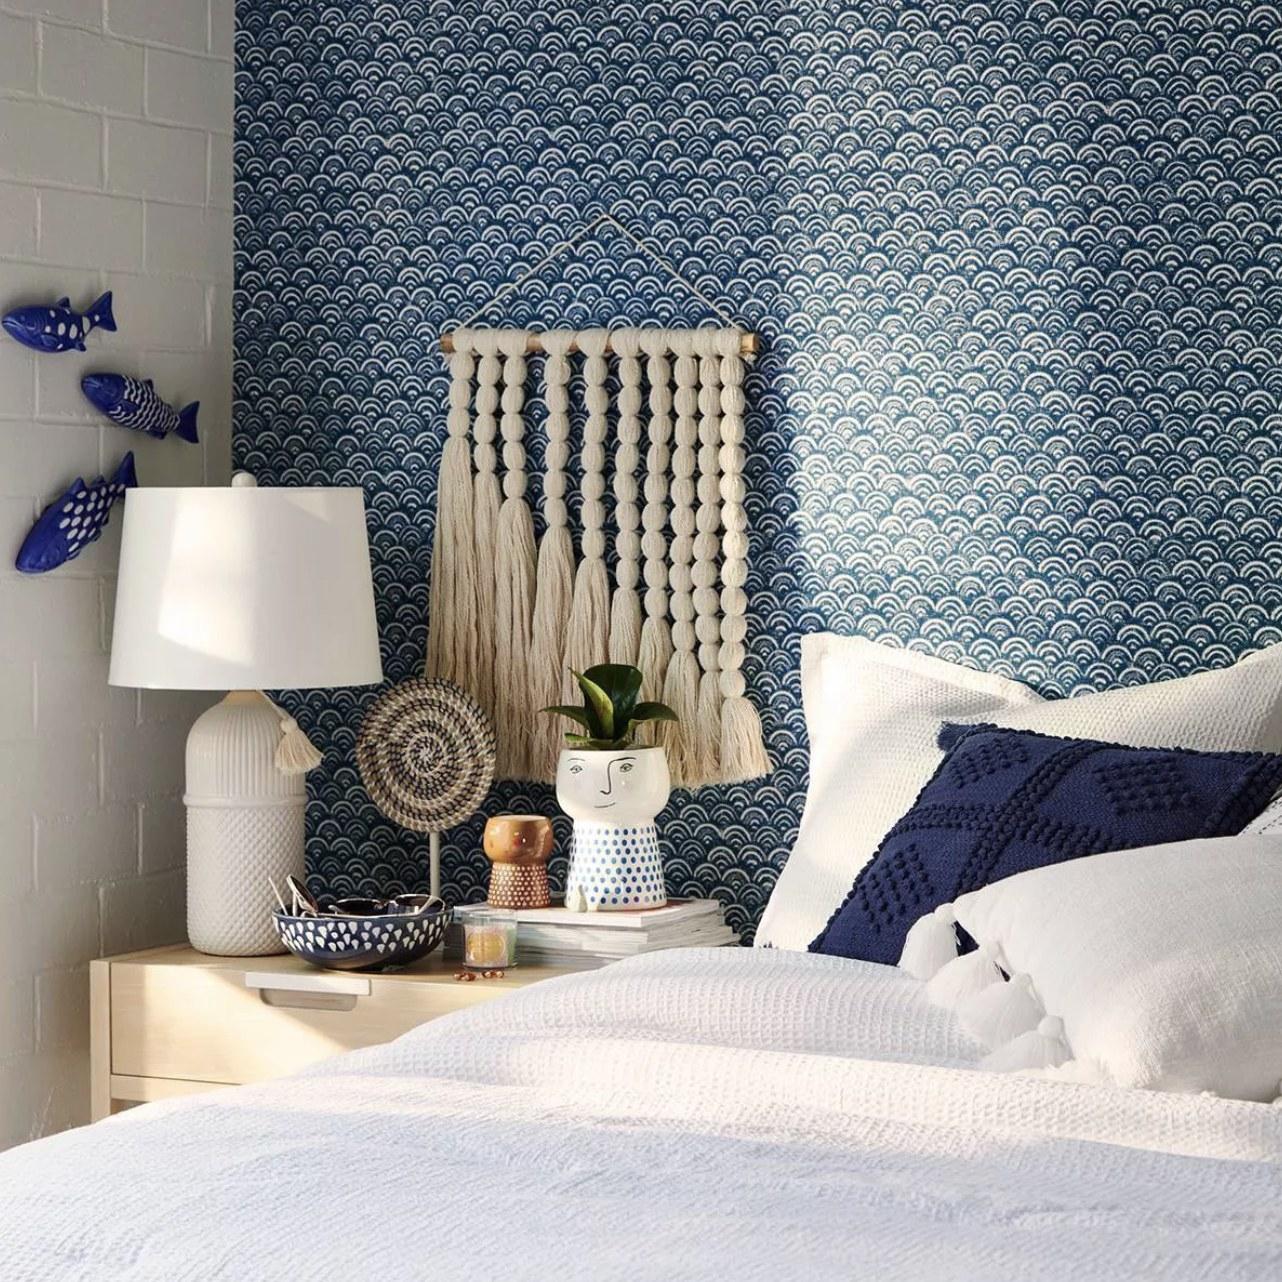 Wall décor on bedroom wall